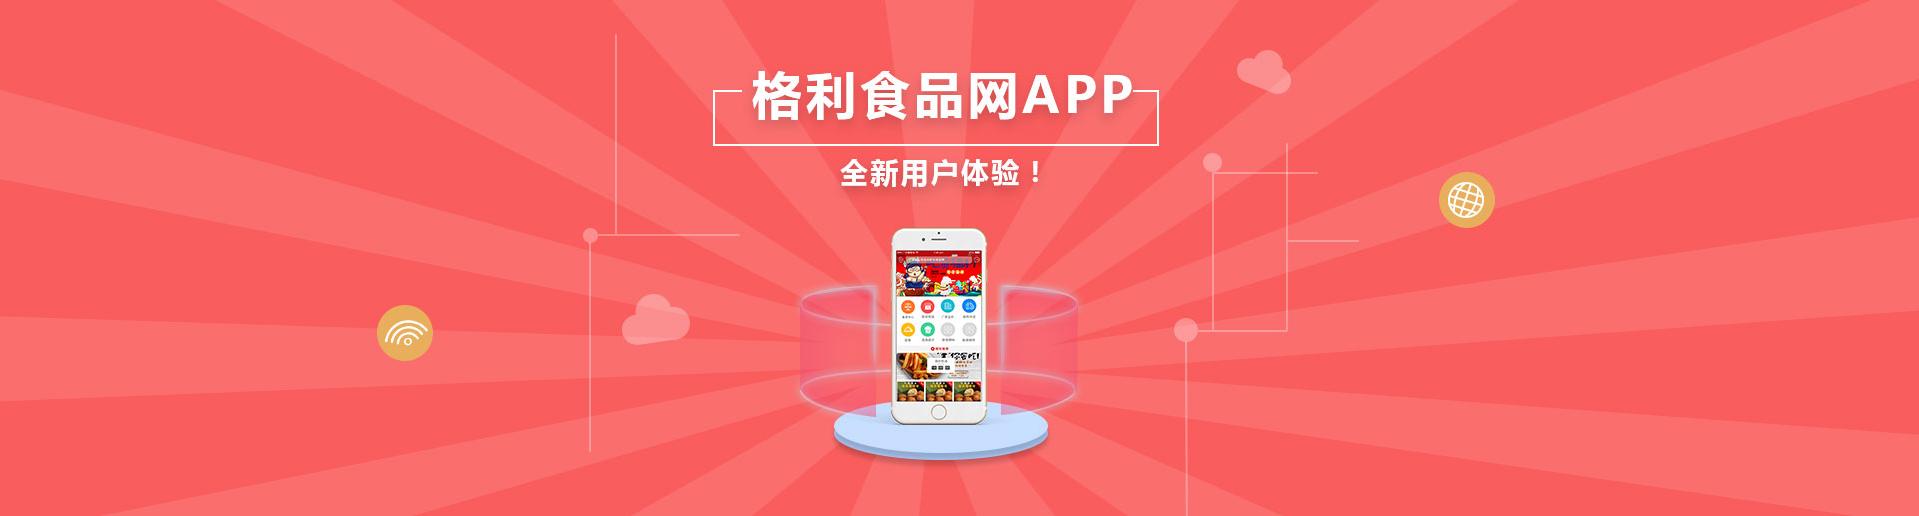 app下载广告